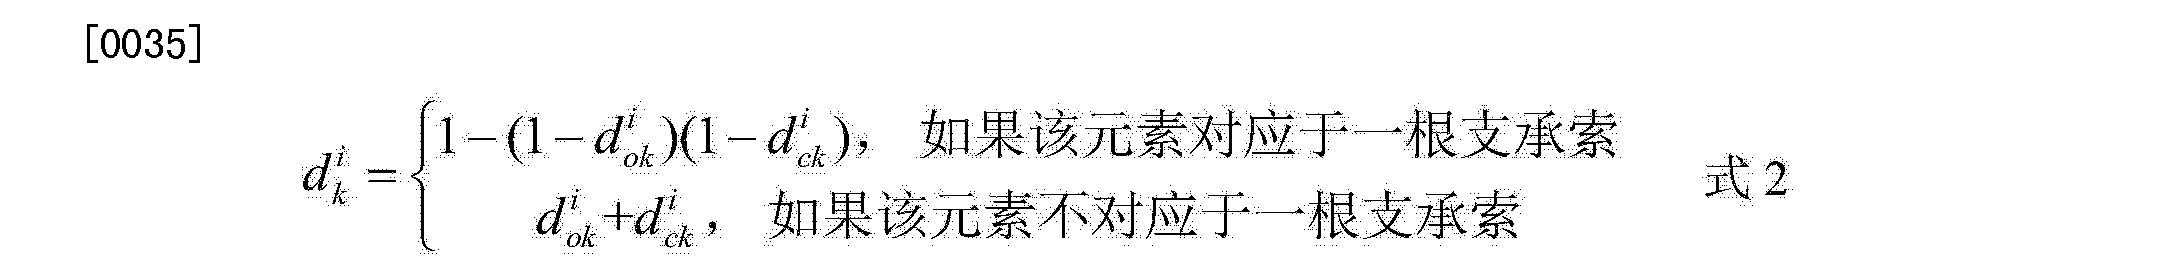 Figure CN103852282AD00222